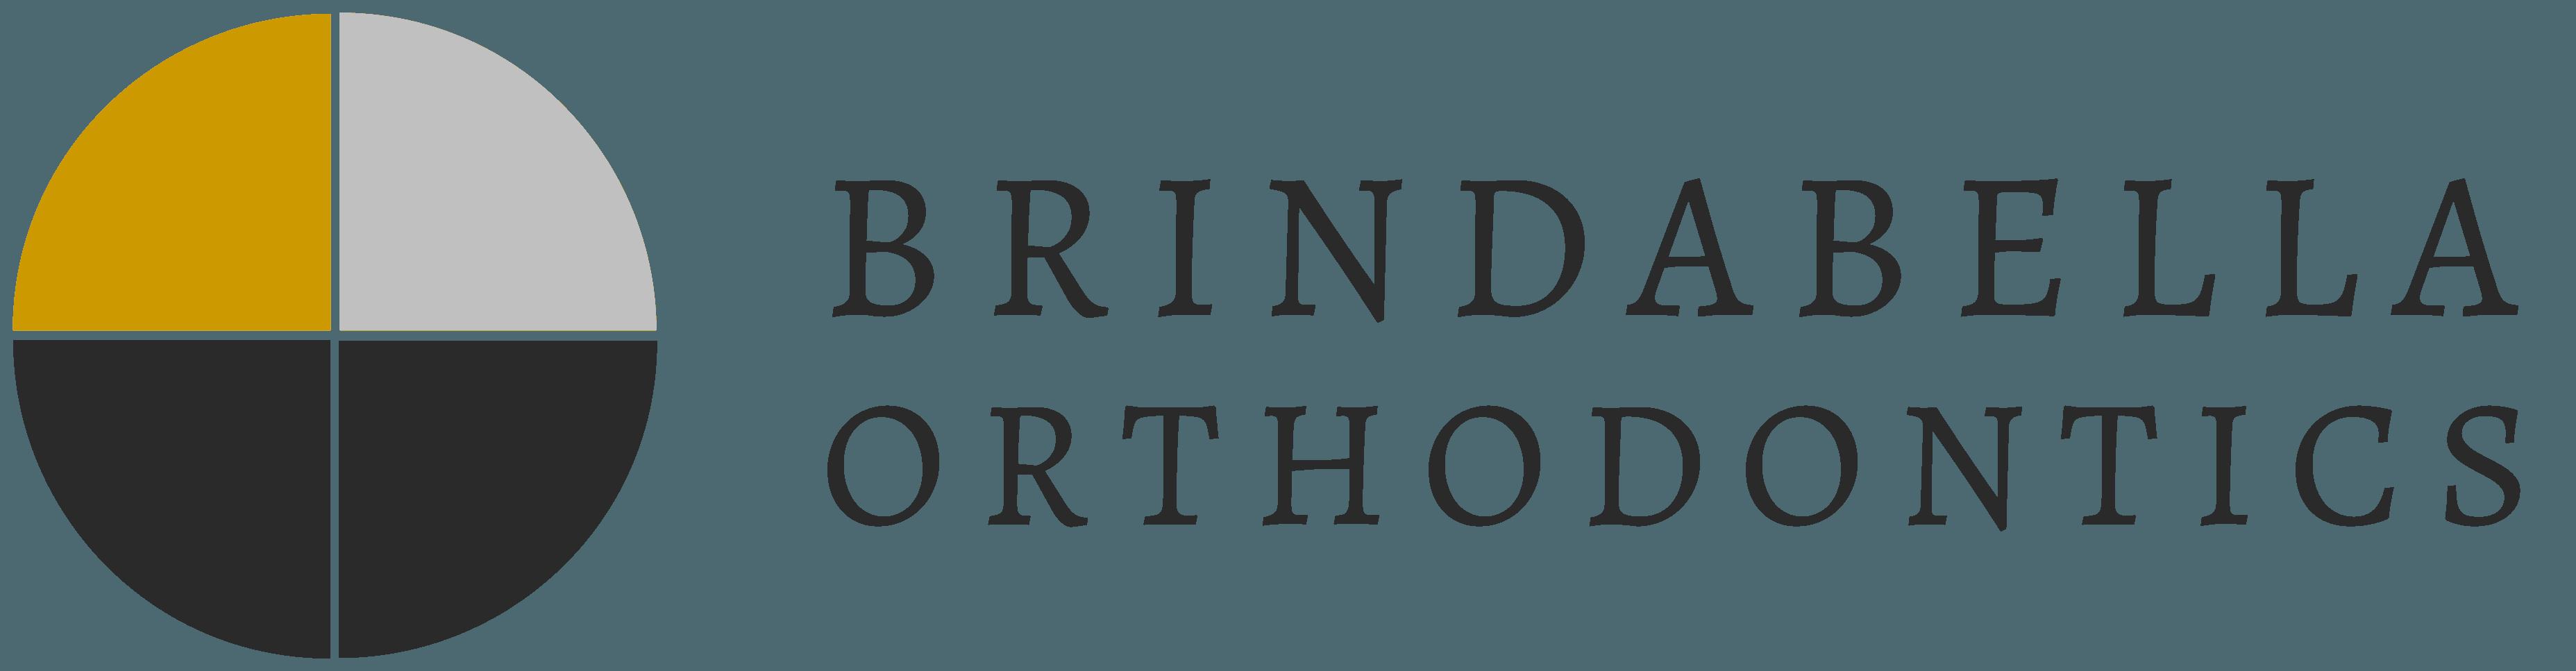 brindabella orthodontics logo